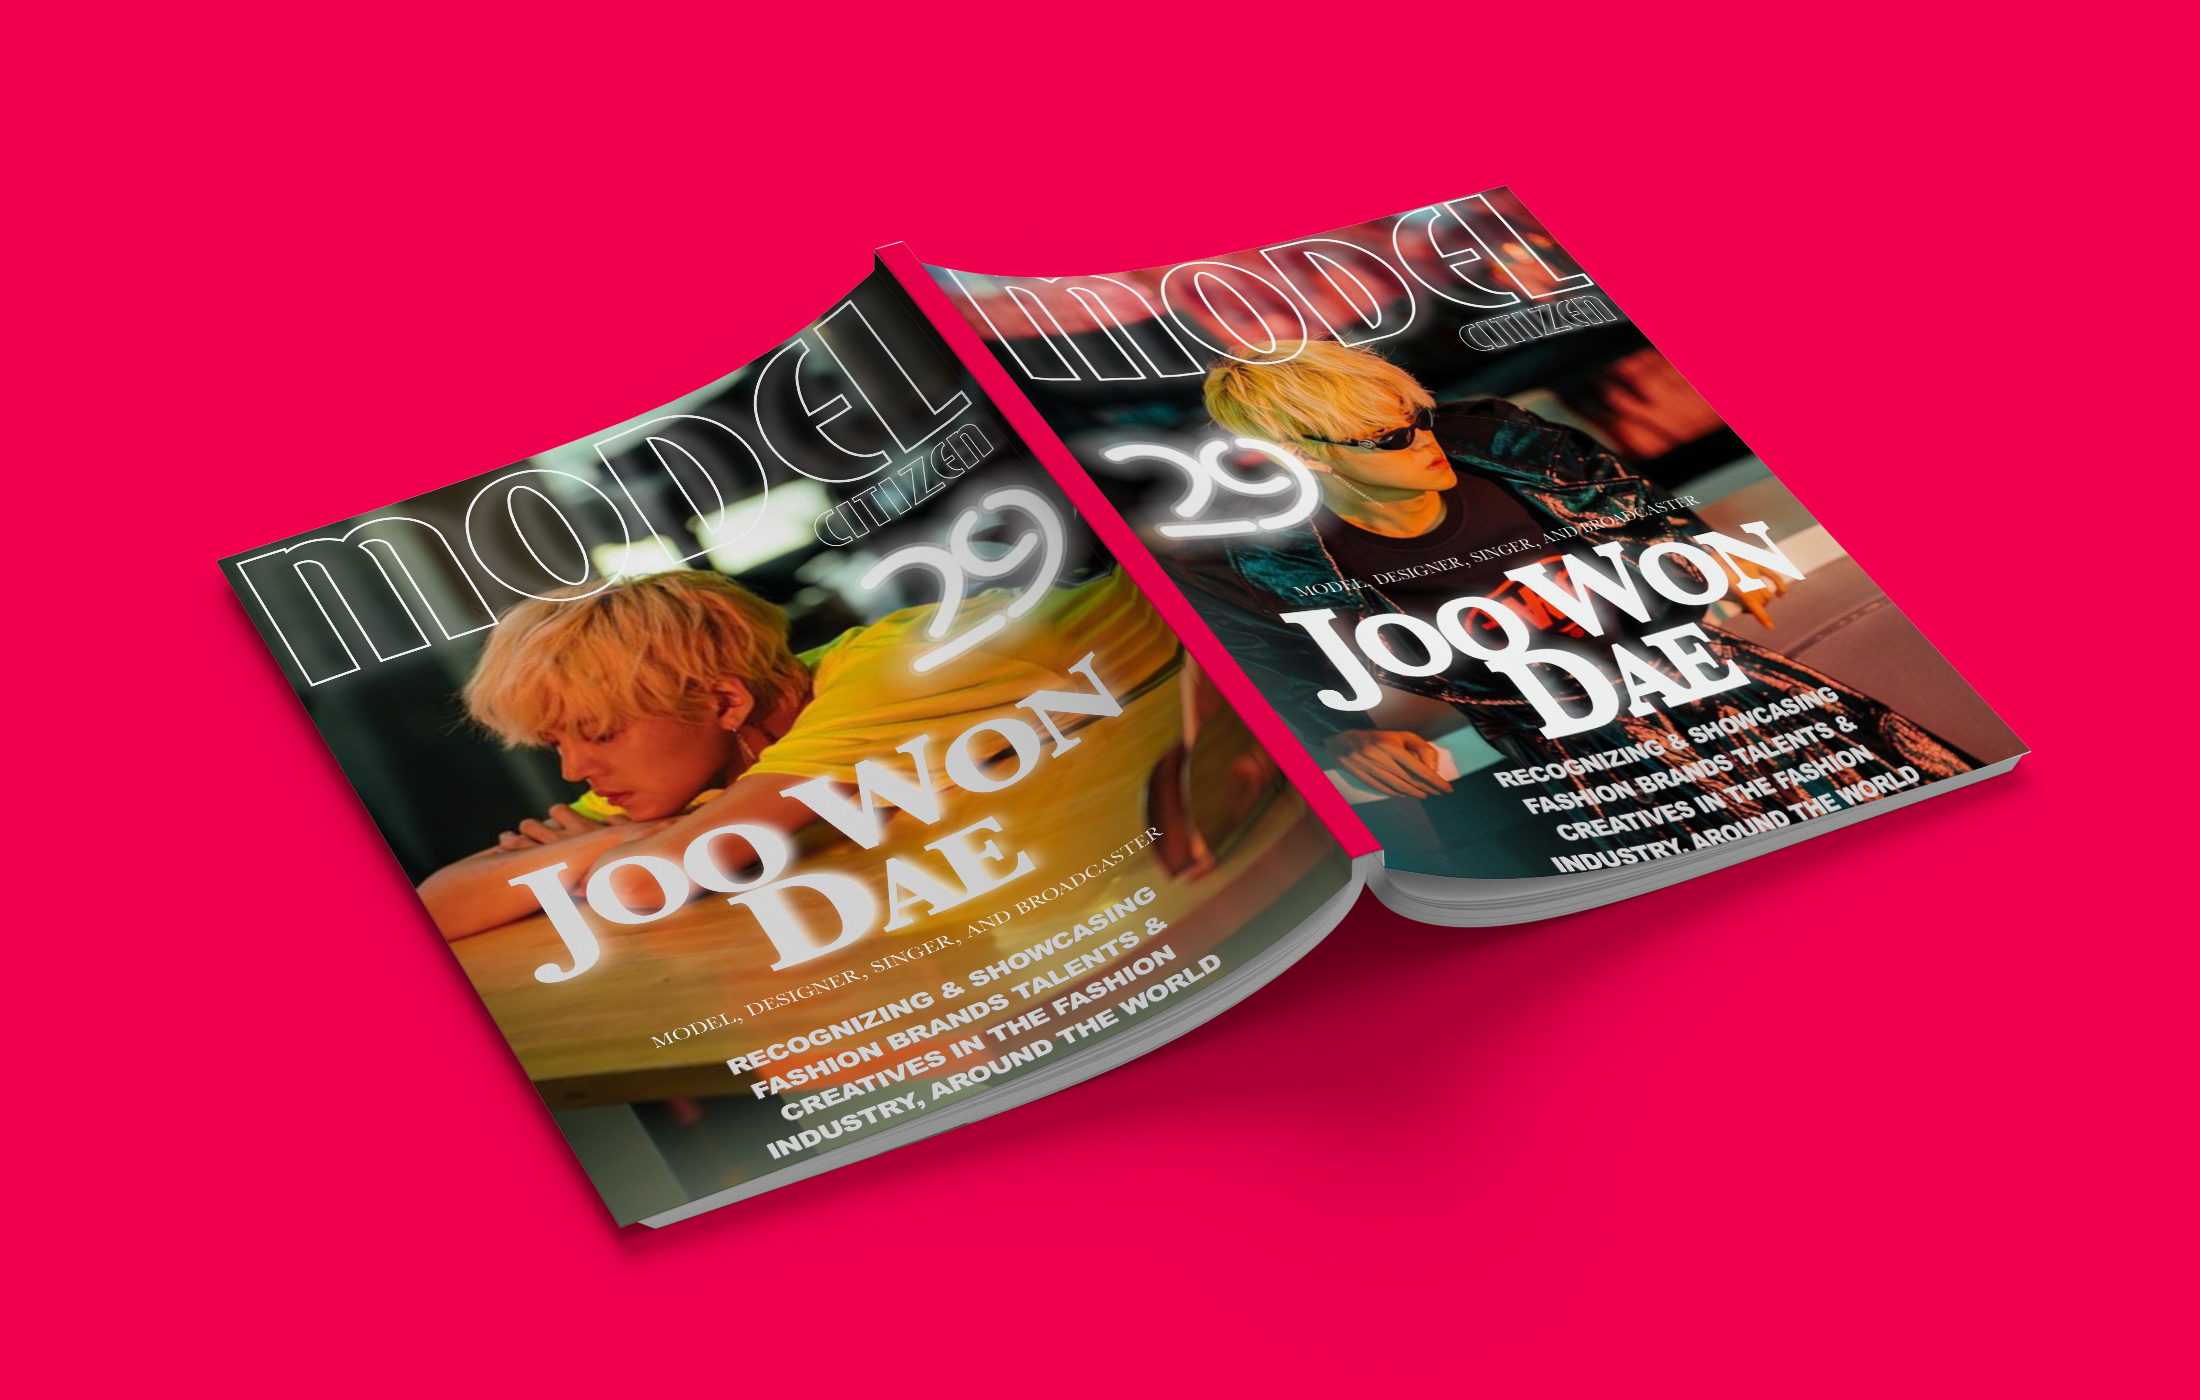 Copy of Copy of Copy of Copy of Copy of Copy of Copy of Copy of Model Citizen Magazine Issue 29, Macky S